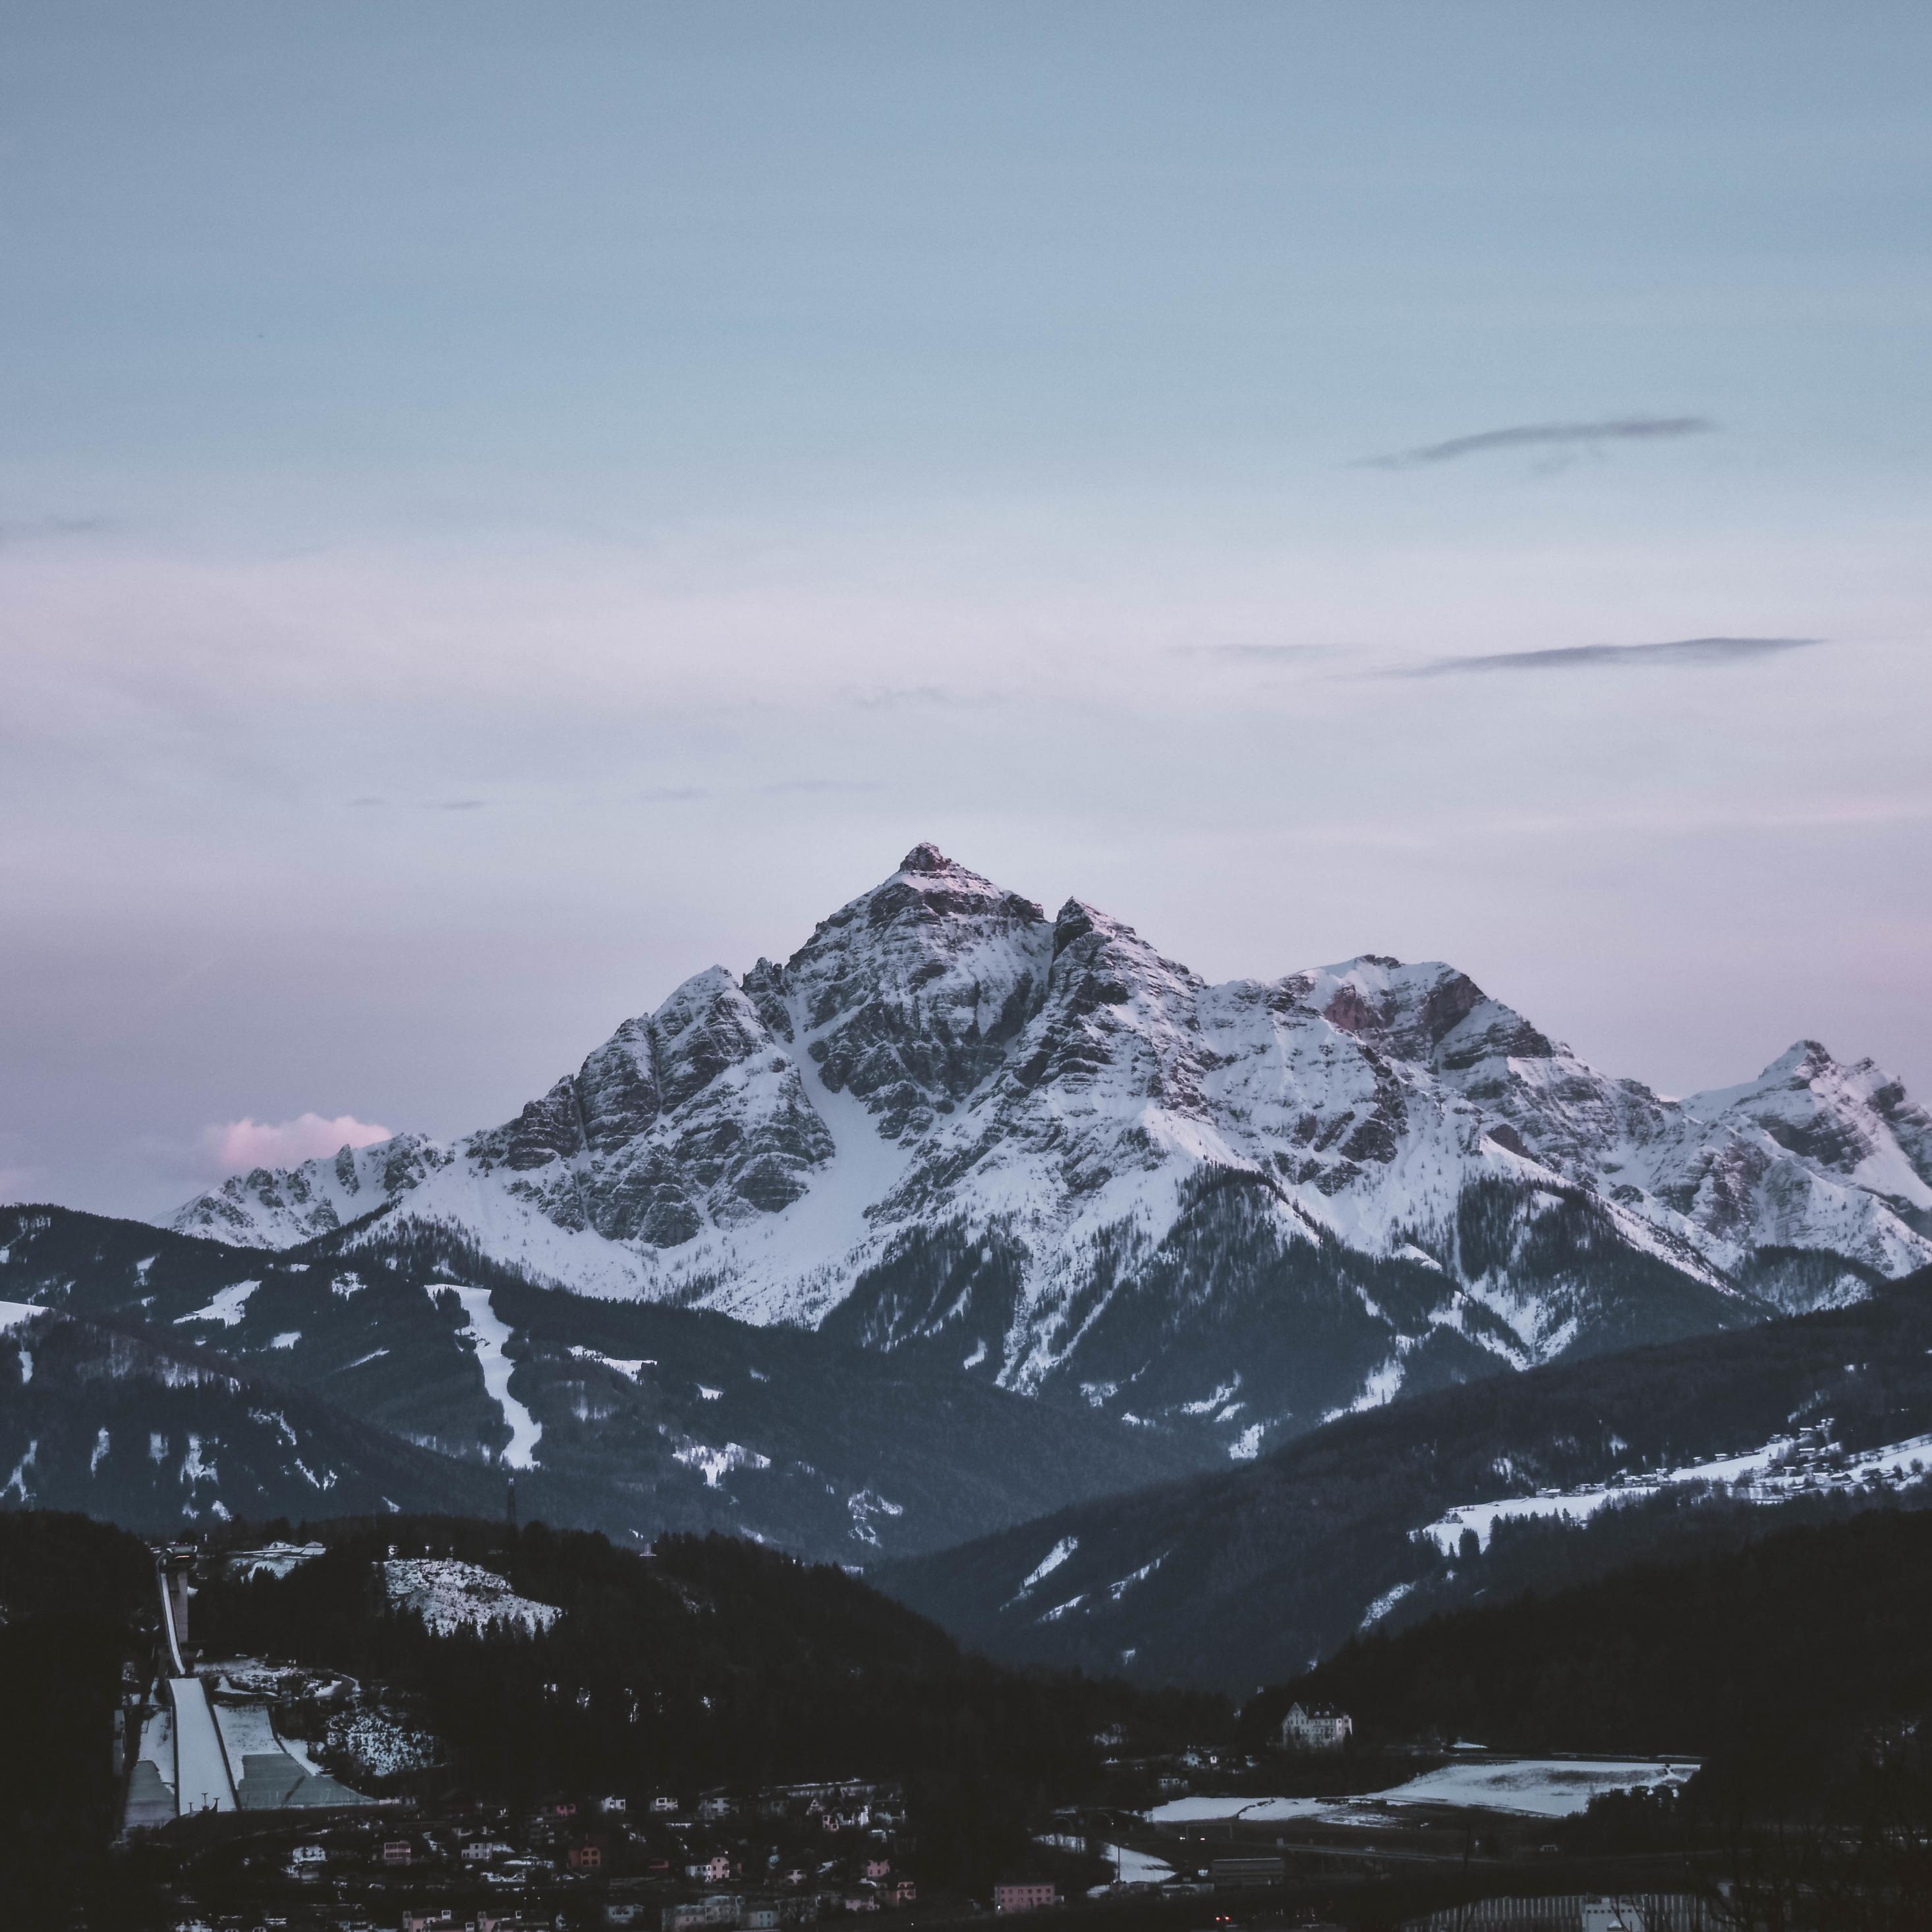 Must see Wallpaper Mountain Ipad Pro - dawn-mountains-sky  2018_84851.jpg